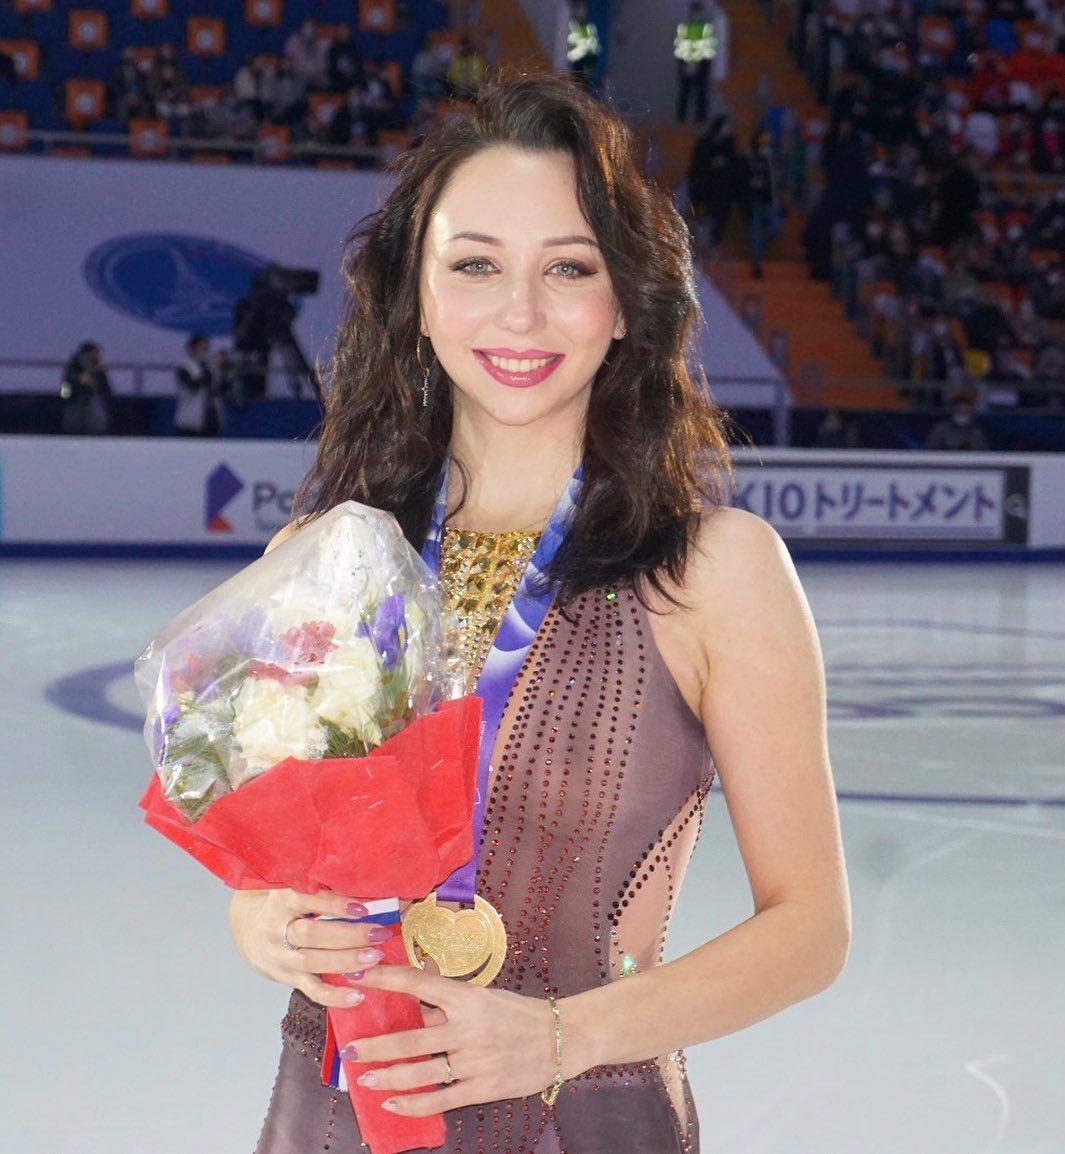 Елизавета Туктамышева / https://www.instagram.com/p/CH8KzlaHWUS/